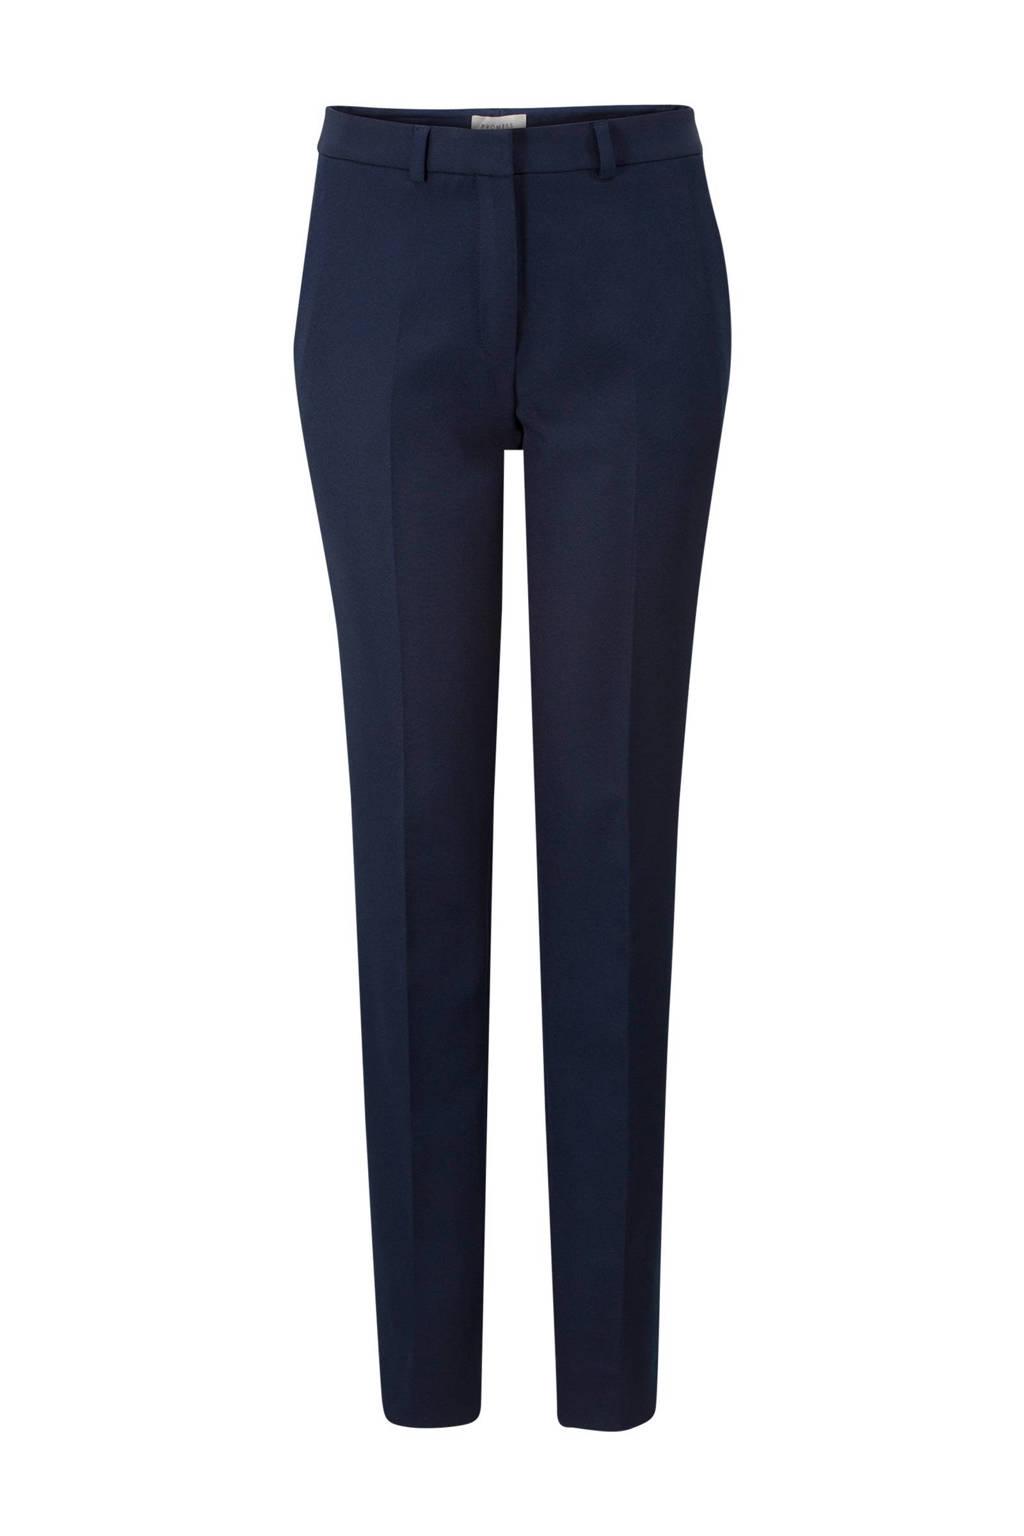 Promiss straight fit pantalon, Blauw